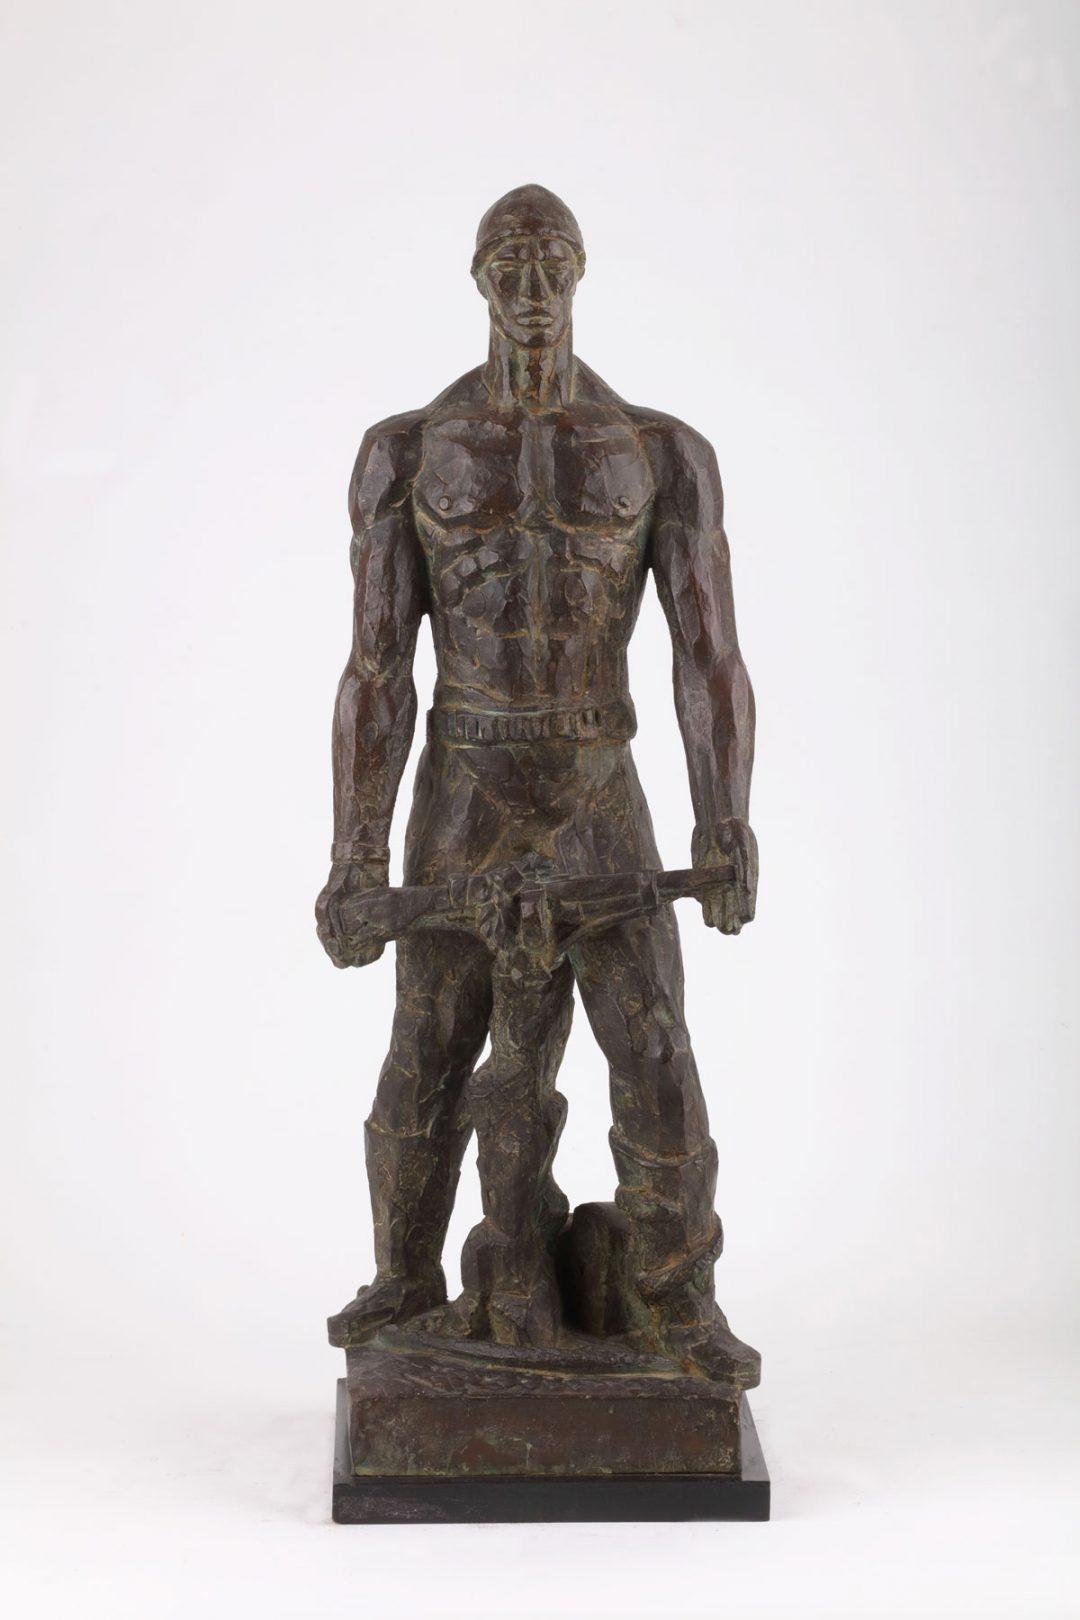 Liberación del Temor (proyecto de monumento a F.D. Roosevelt)